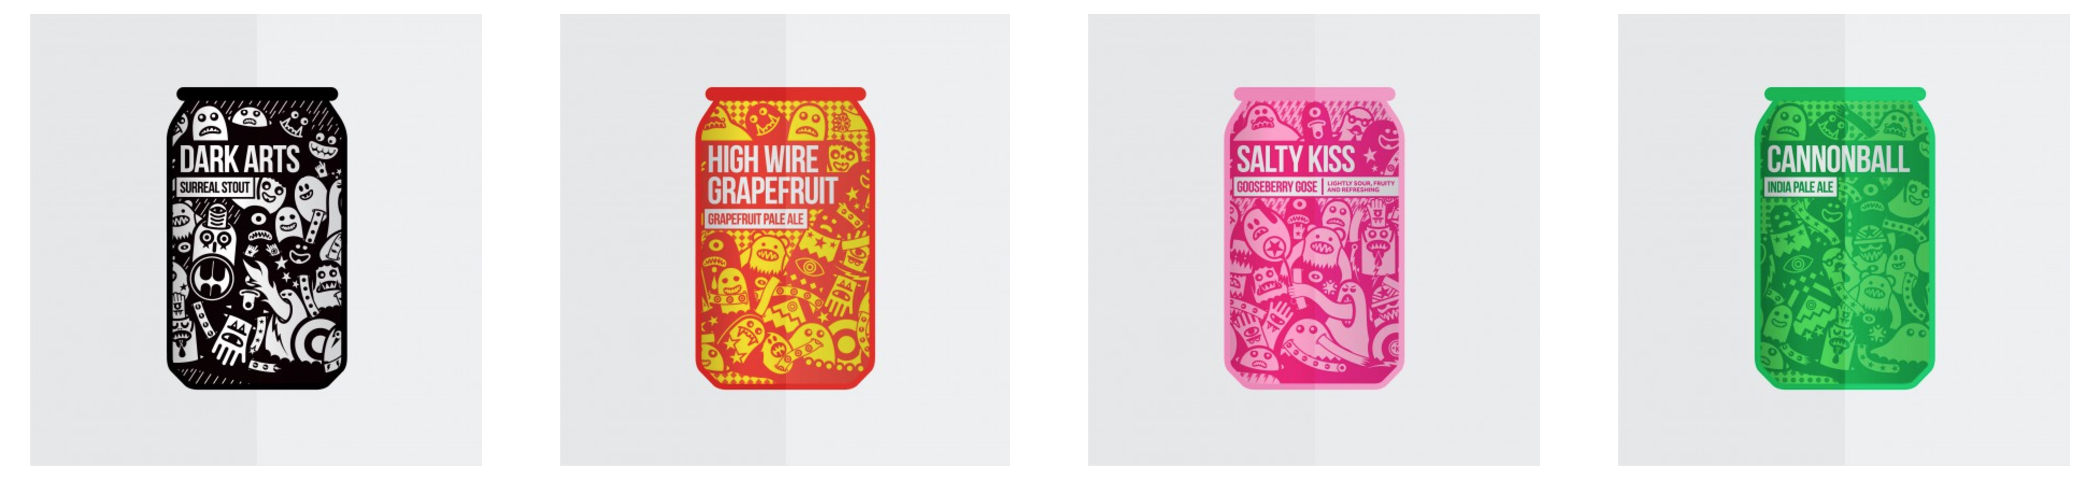 Magic Rock | Branding in Breweries | Marvellous Digital AgencyMagic Rock | Branding in Breweries | Marvellous Digital Agency